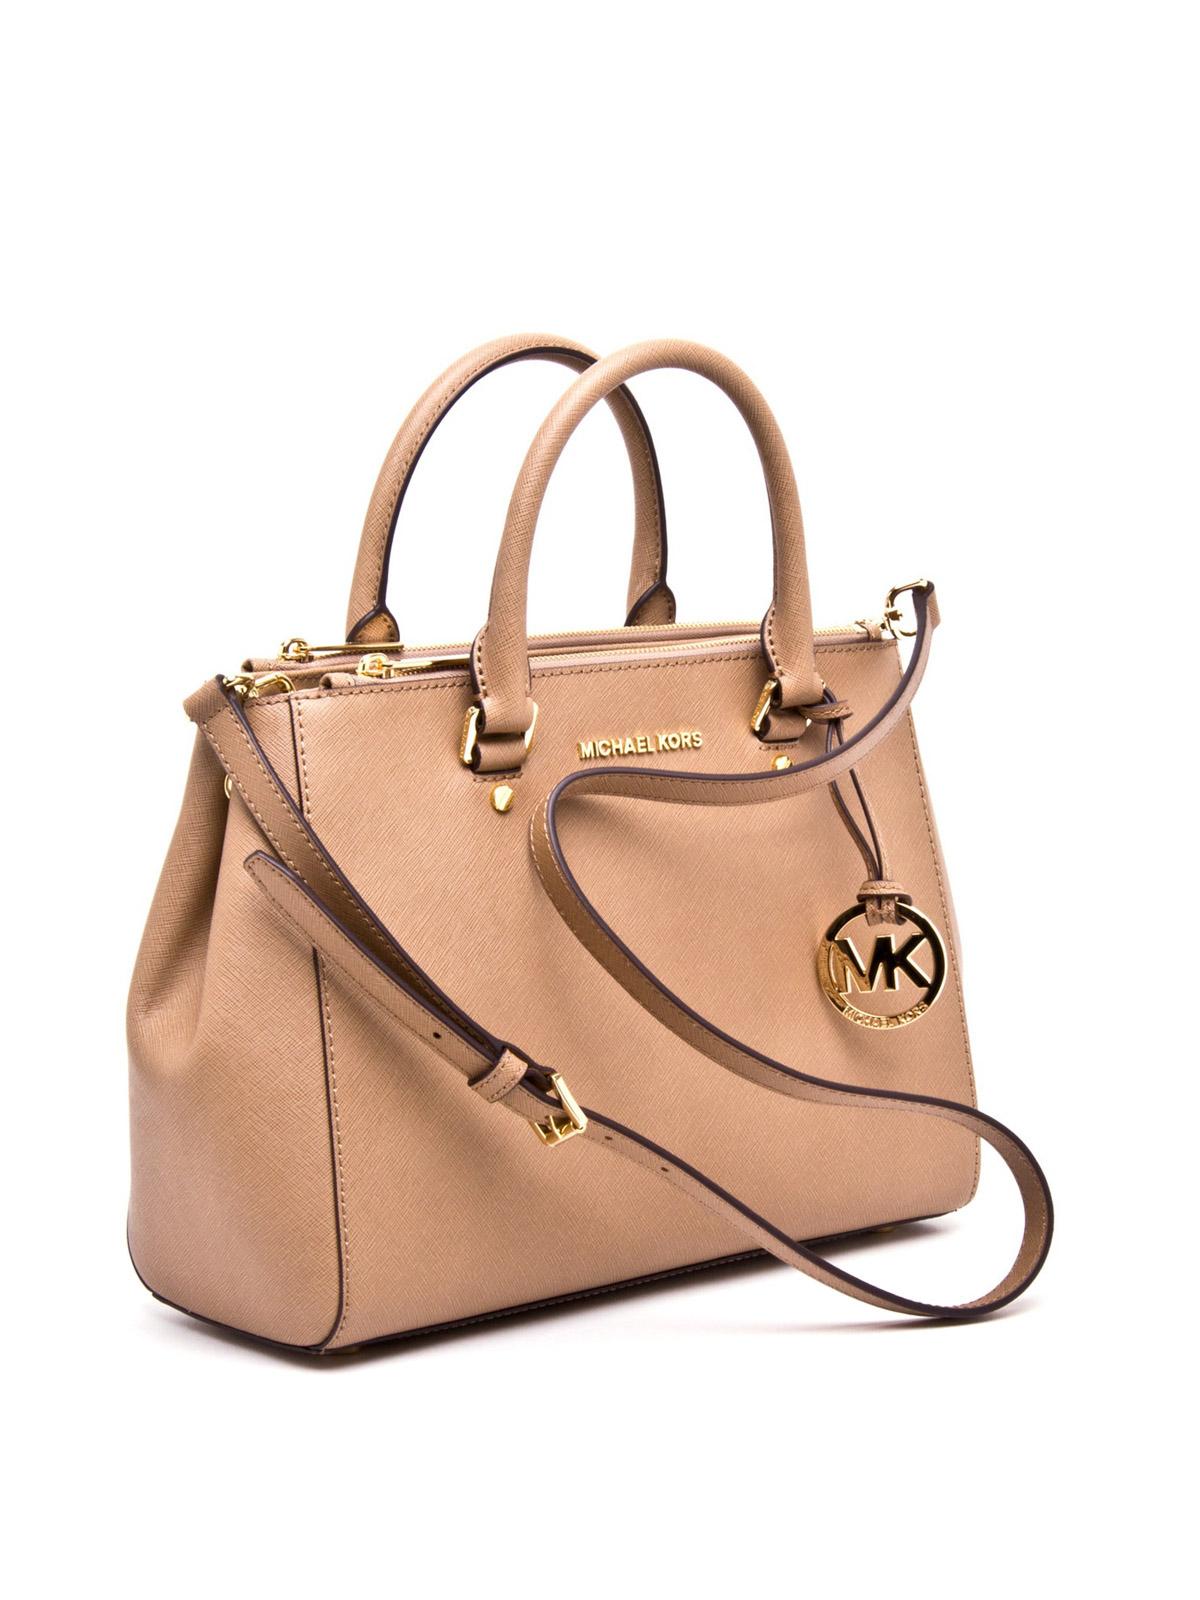 Michael Kors Sutton Handtasche Aus Leder Handtaschen